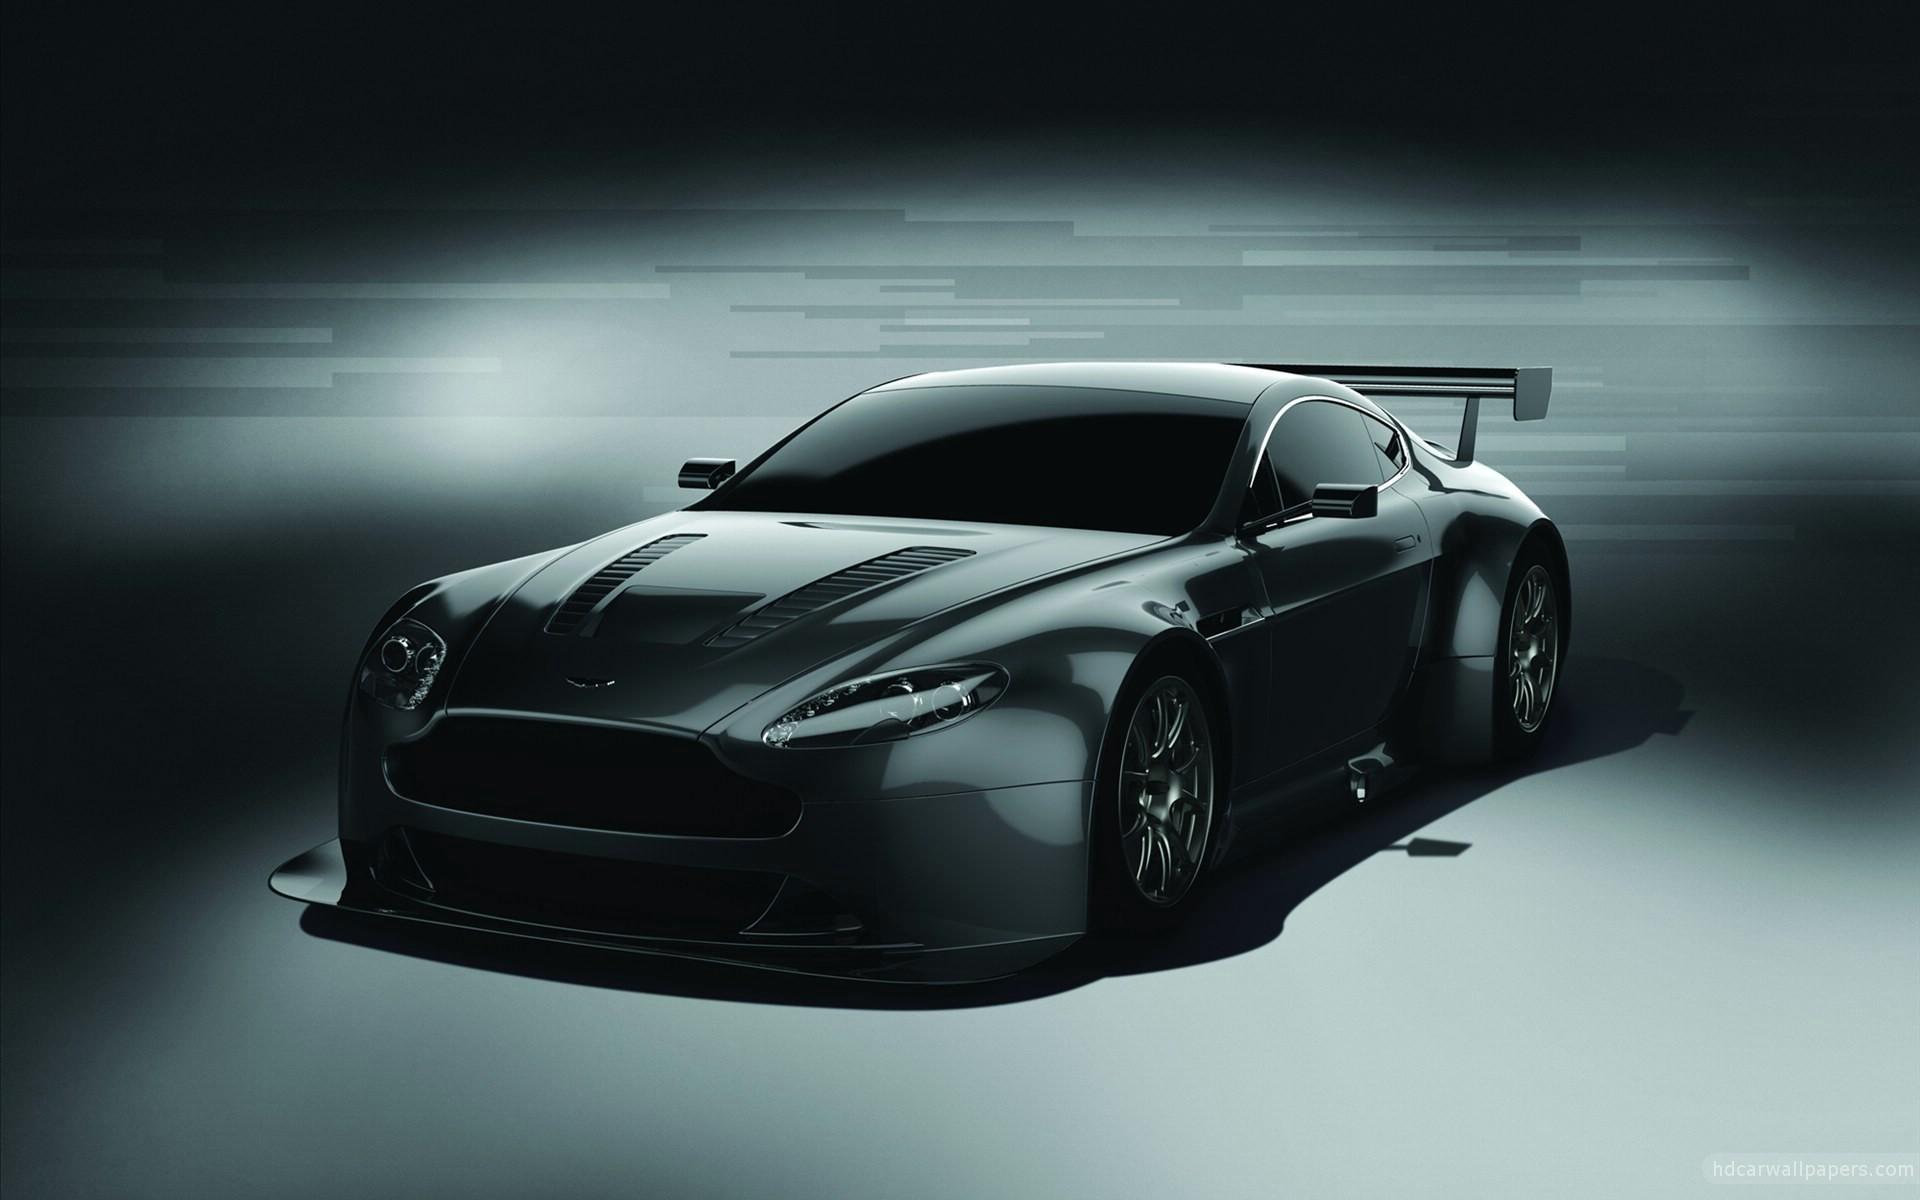 Aston Martin Cars 23 Free Hd Wallpaper